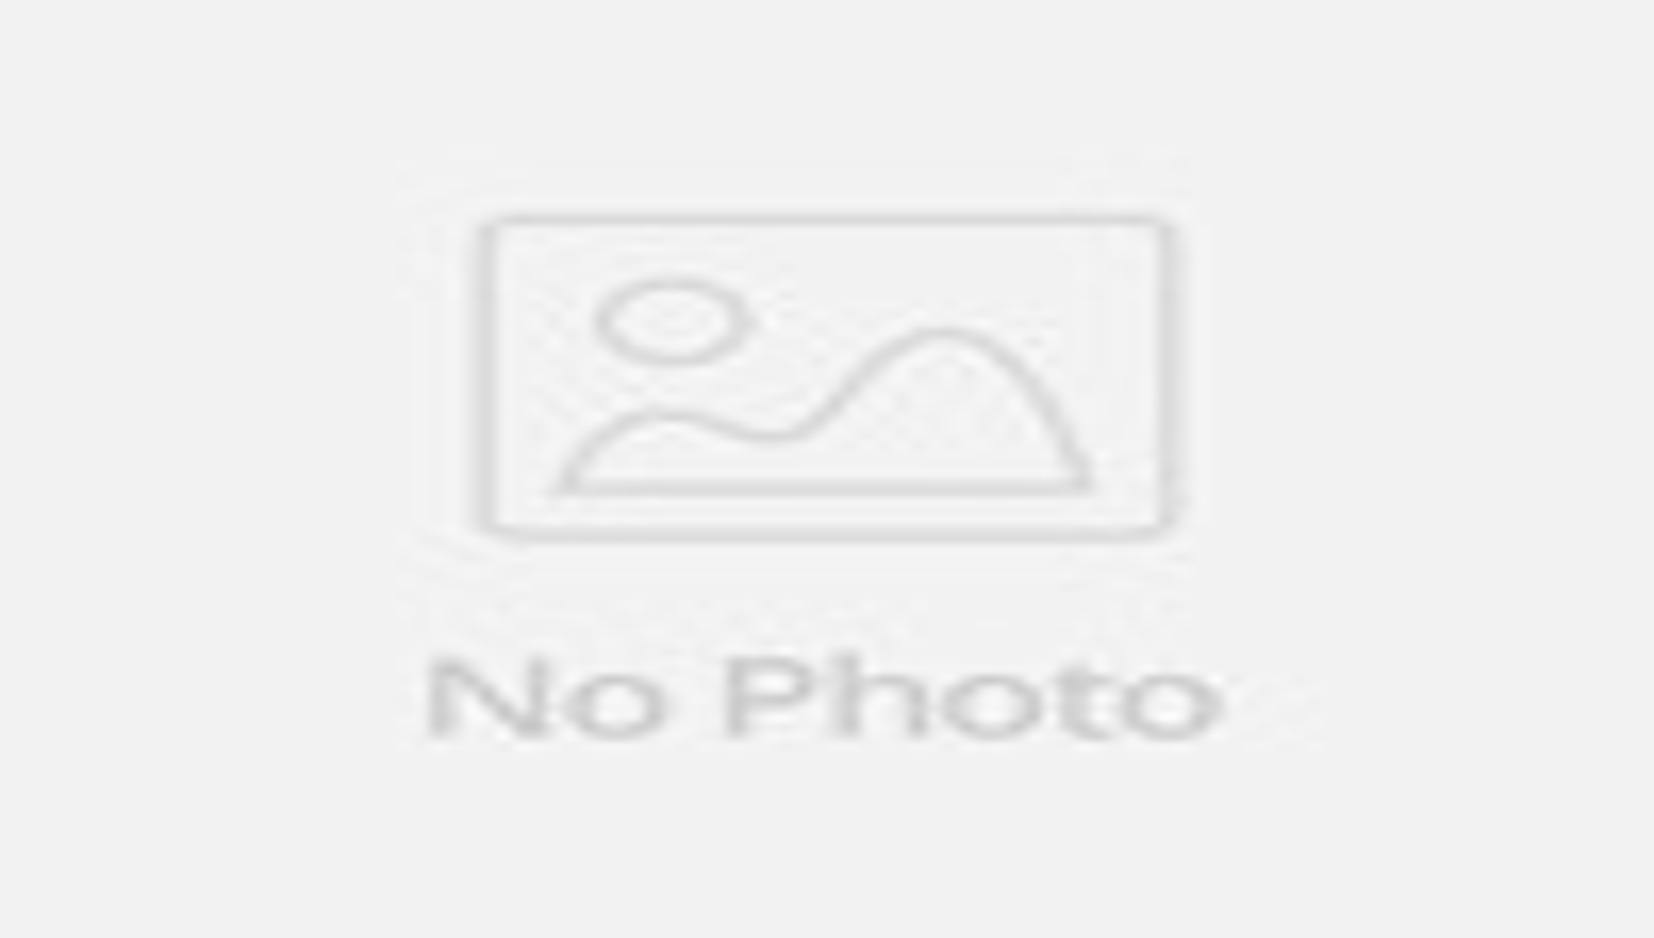 Italian Bedroom Furniture 2013 italian bedroom furniture companies | bedroom furniture